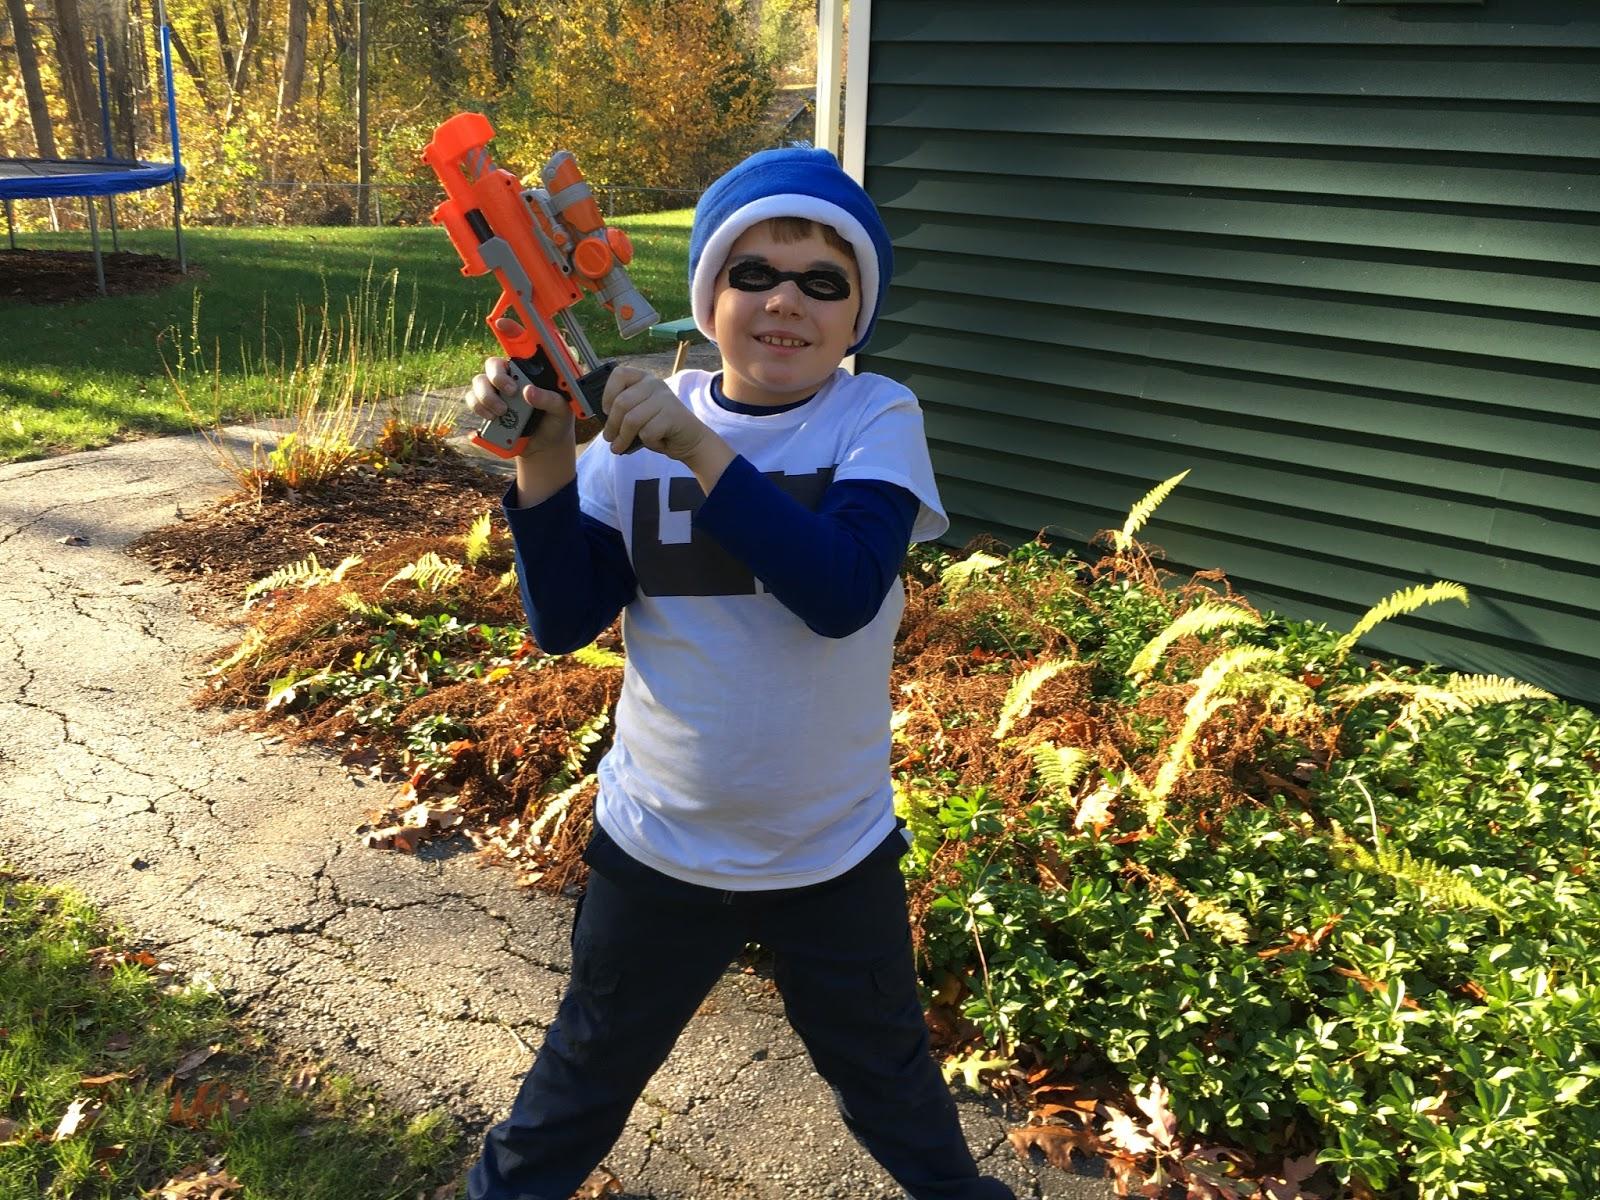 Mommy Spirit: A Nintendo Inkling Halloween